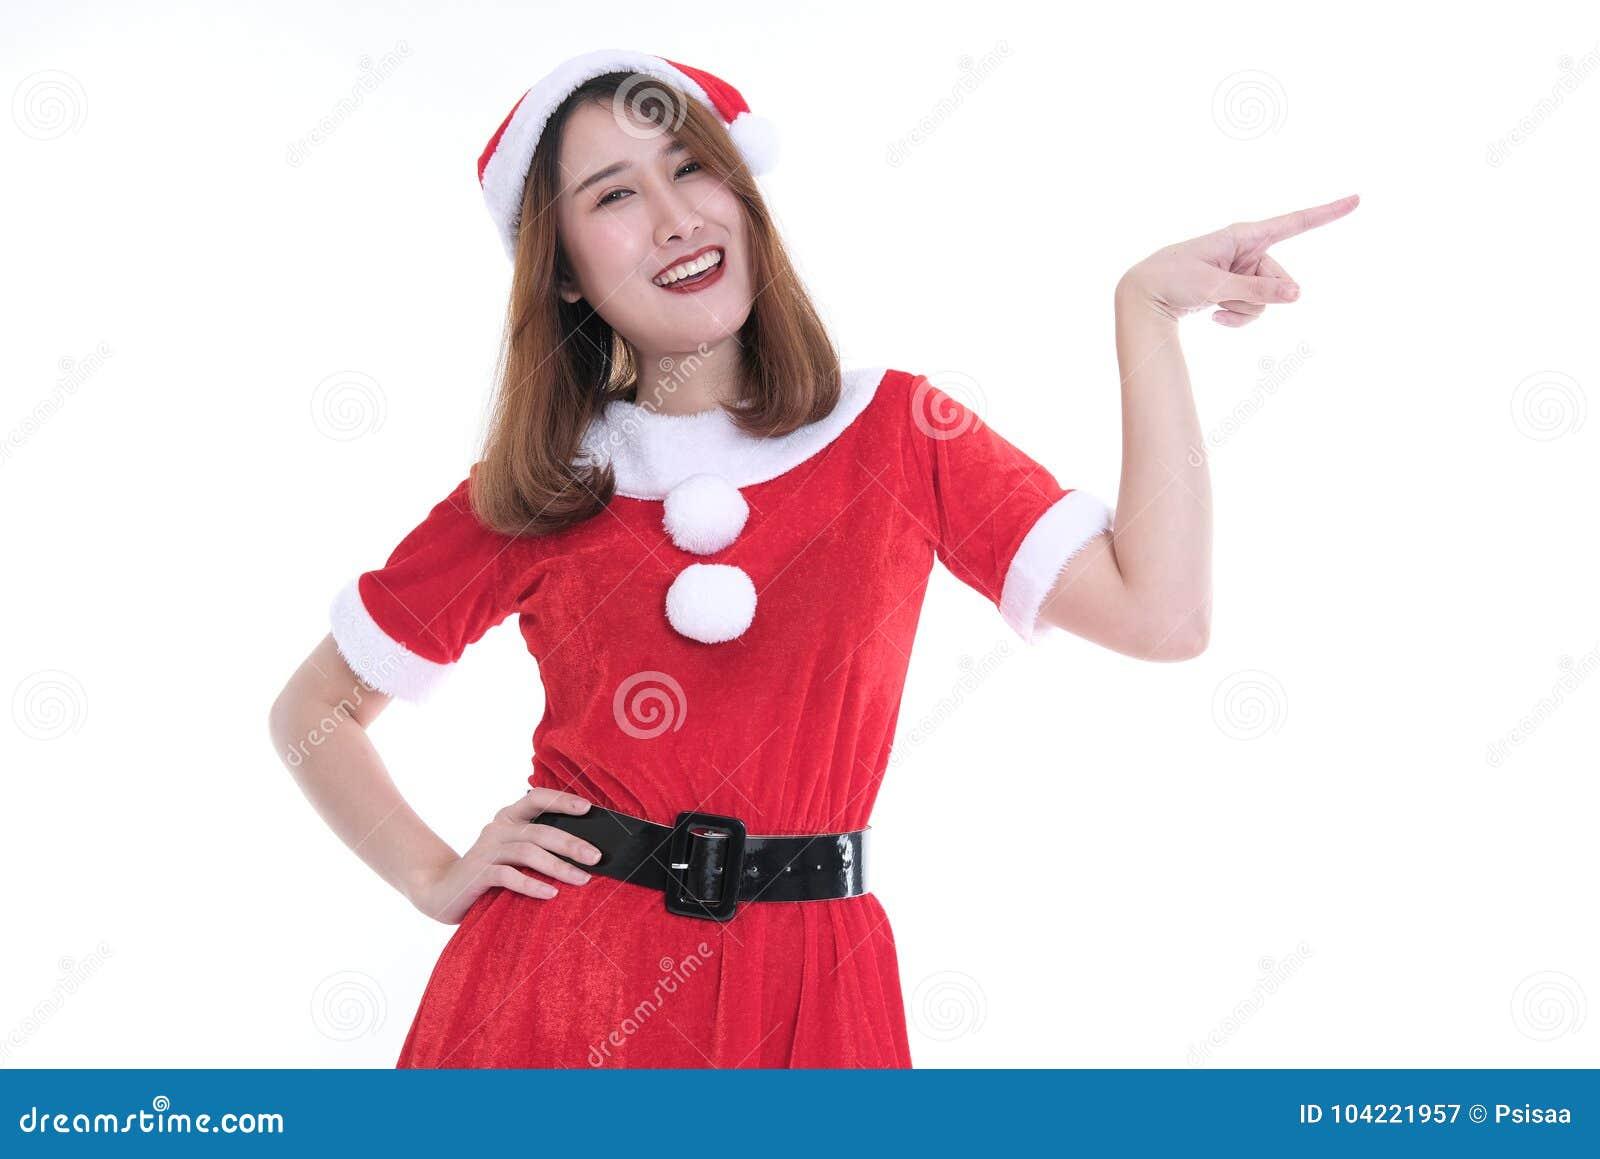 b462726ae4712 portrait of asian woman in santa claus dress on white background. christmas  holiday. merry xmas celebration. season  x27 s greetings